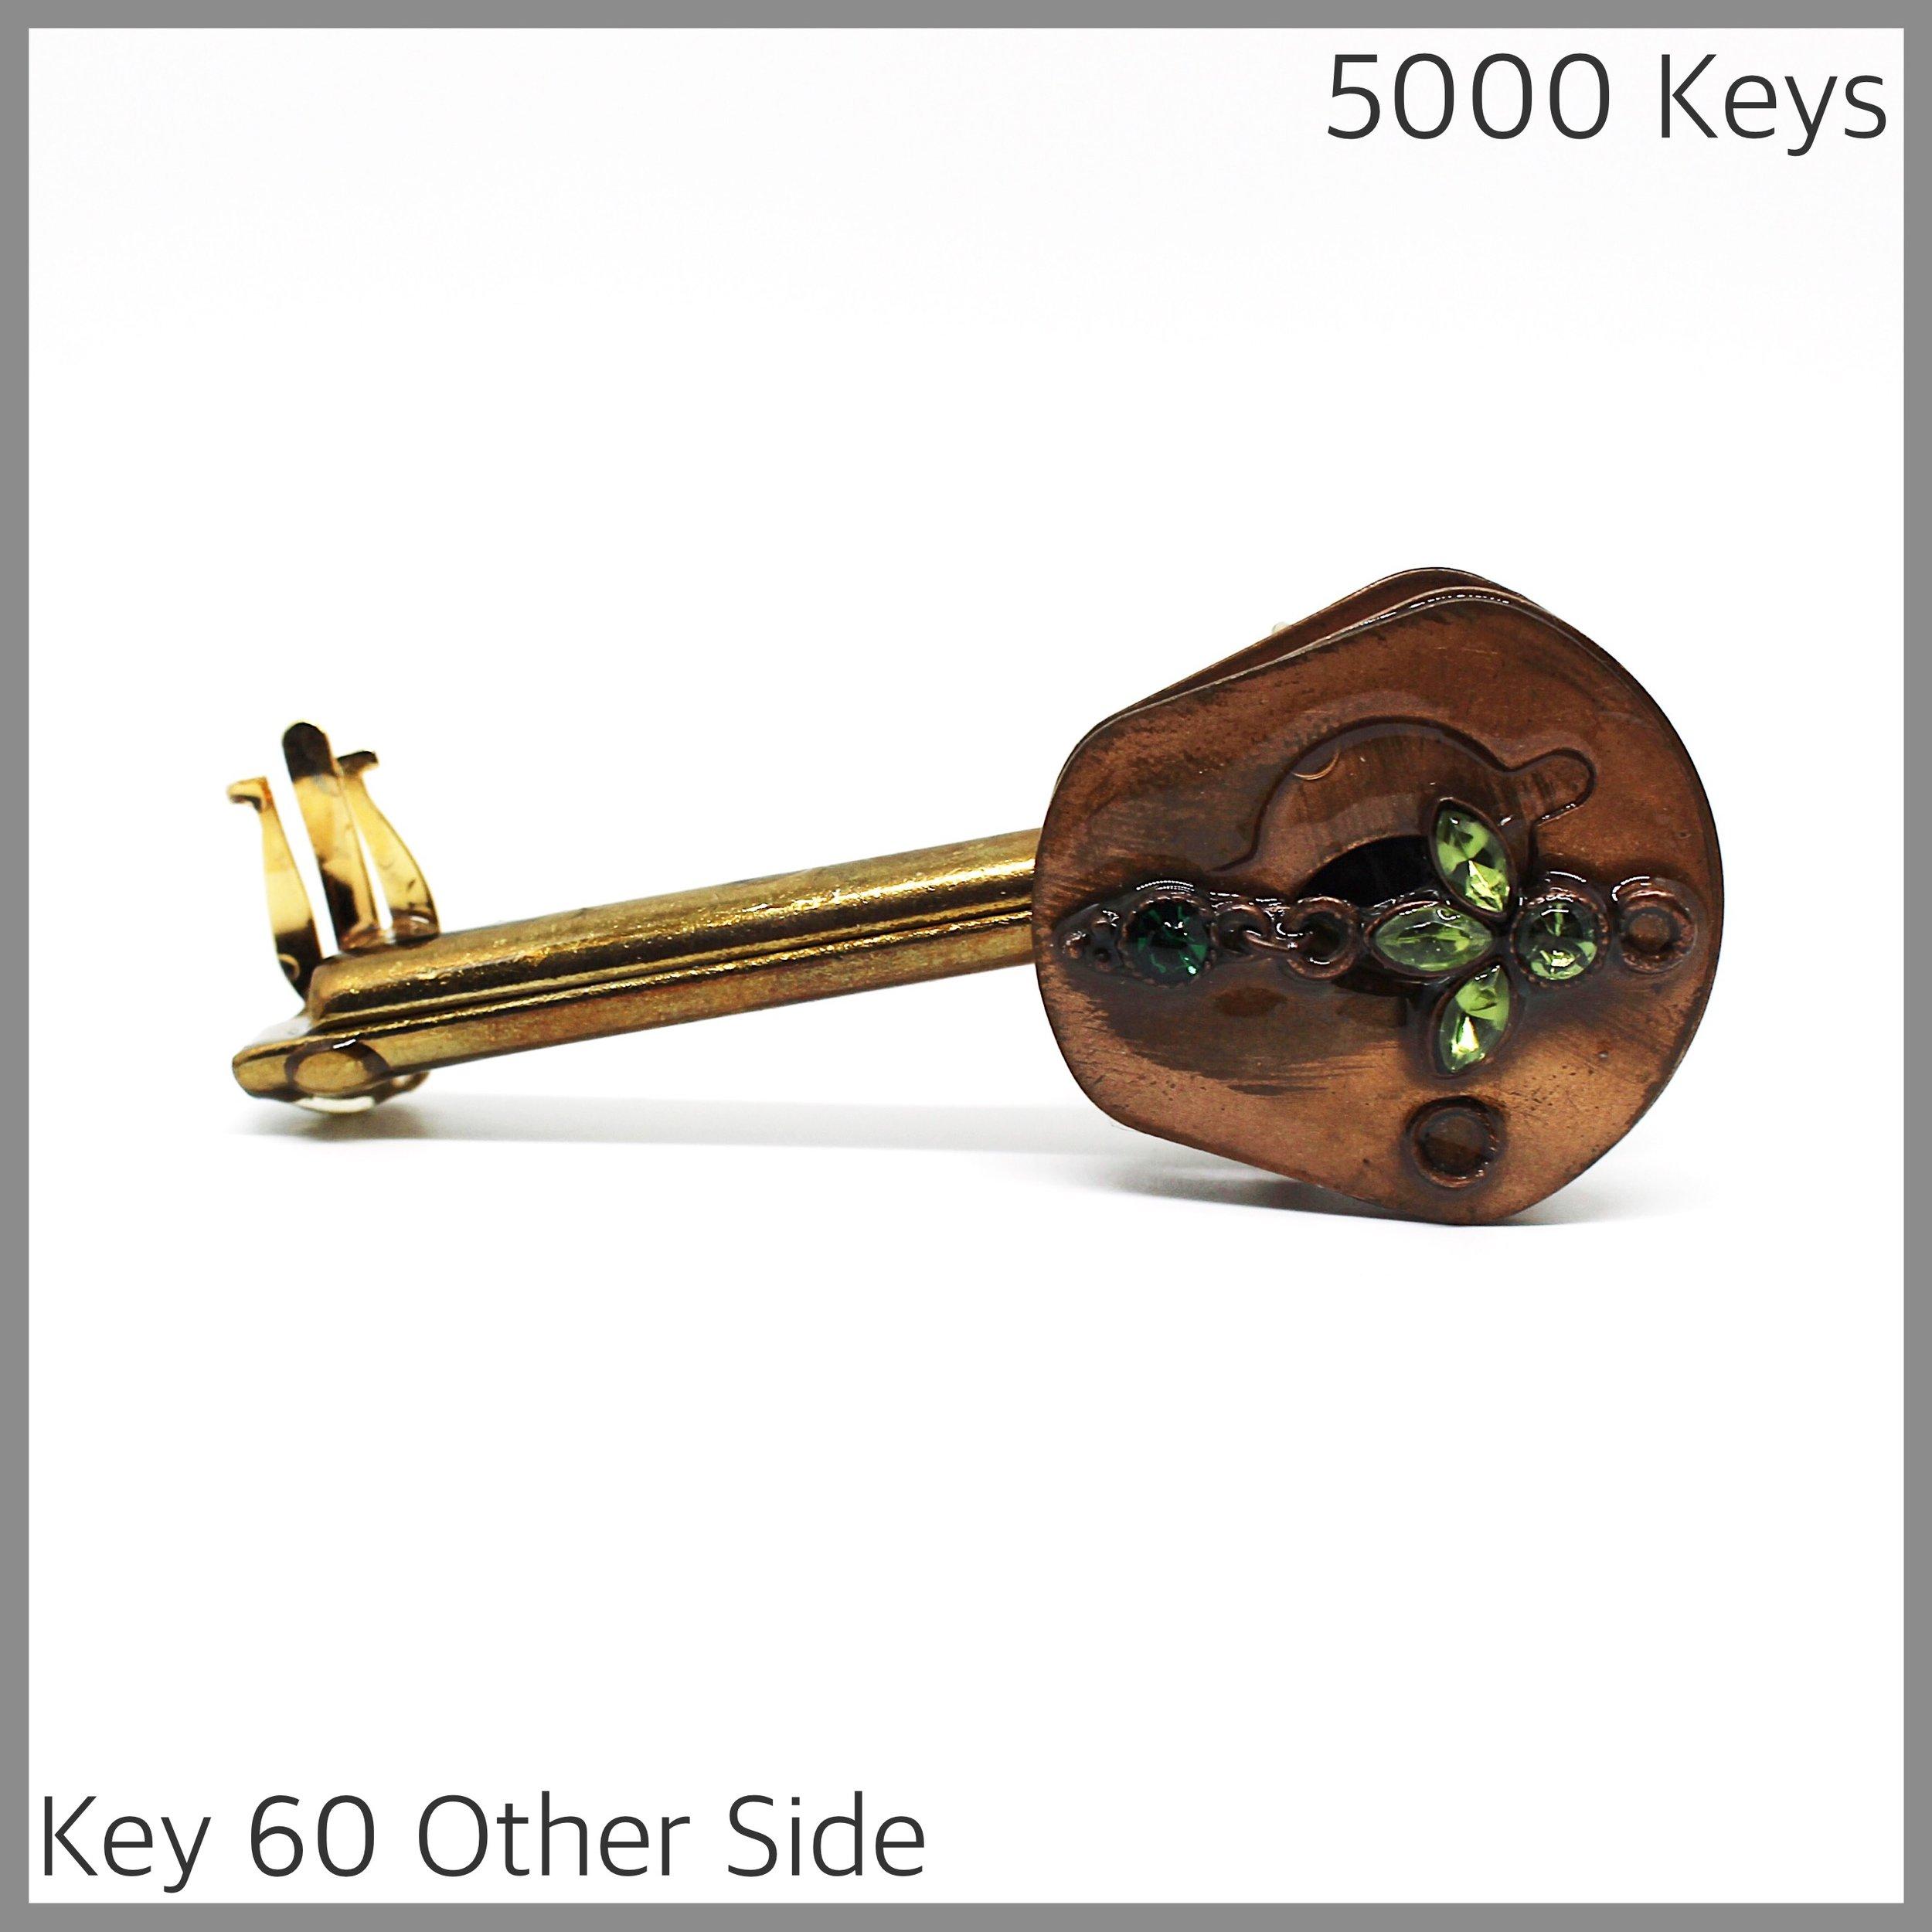 Key 60 other side - 1.JPG